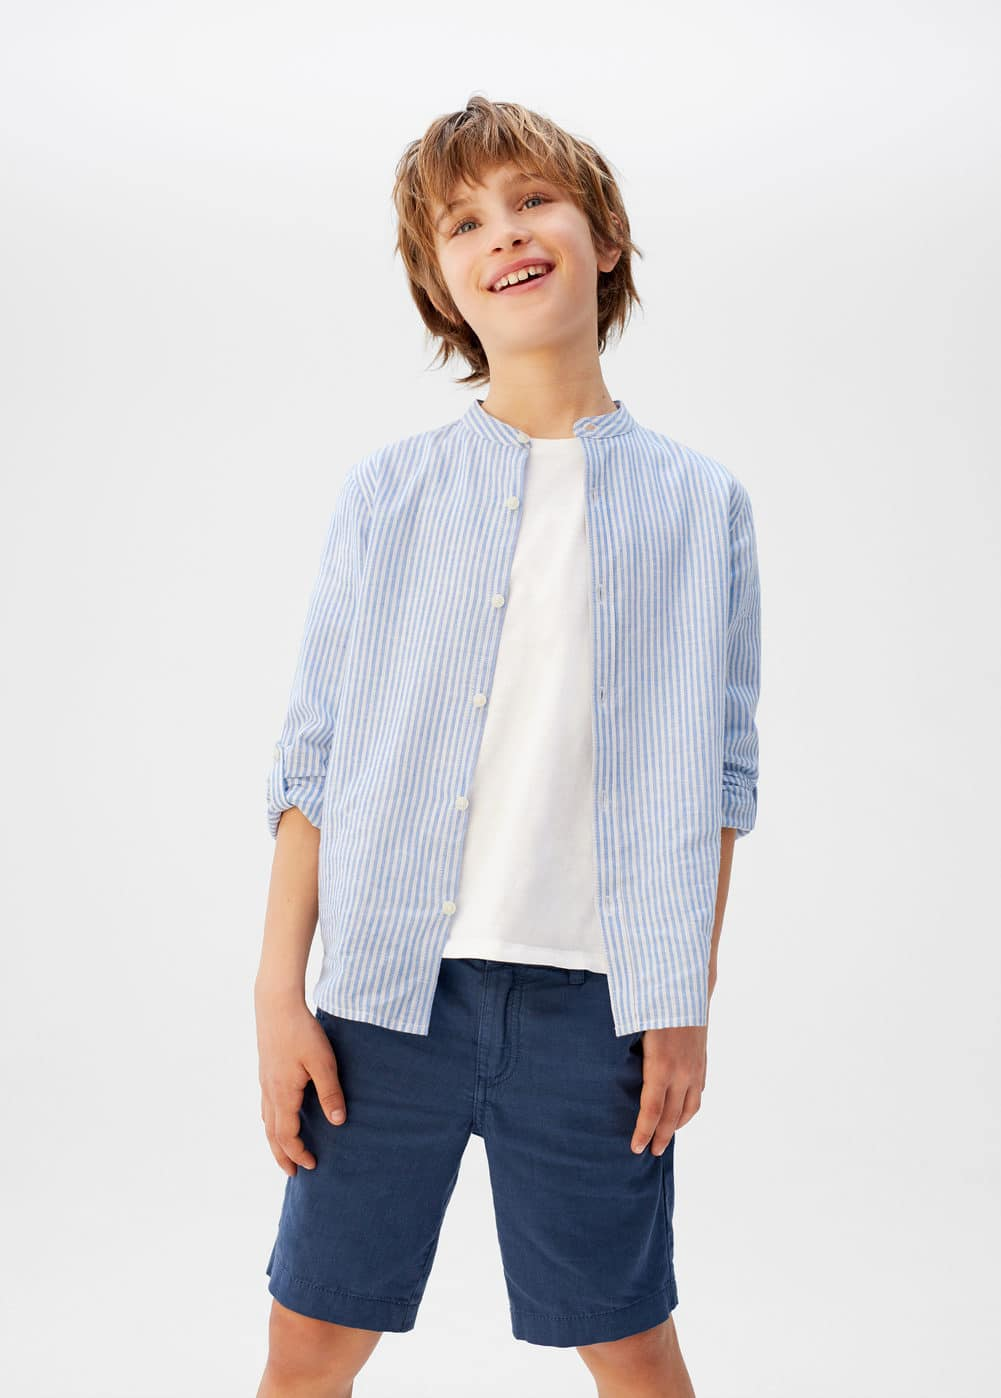 o-form:camisa lino rayas